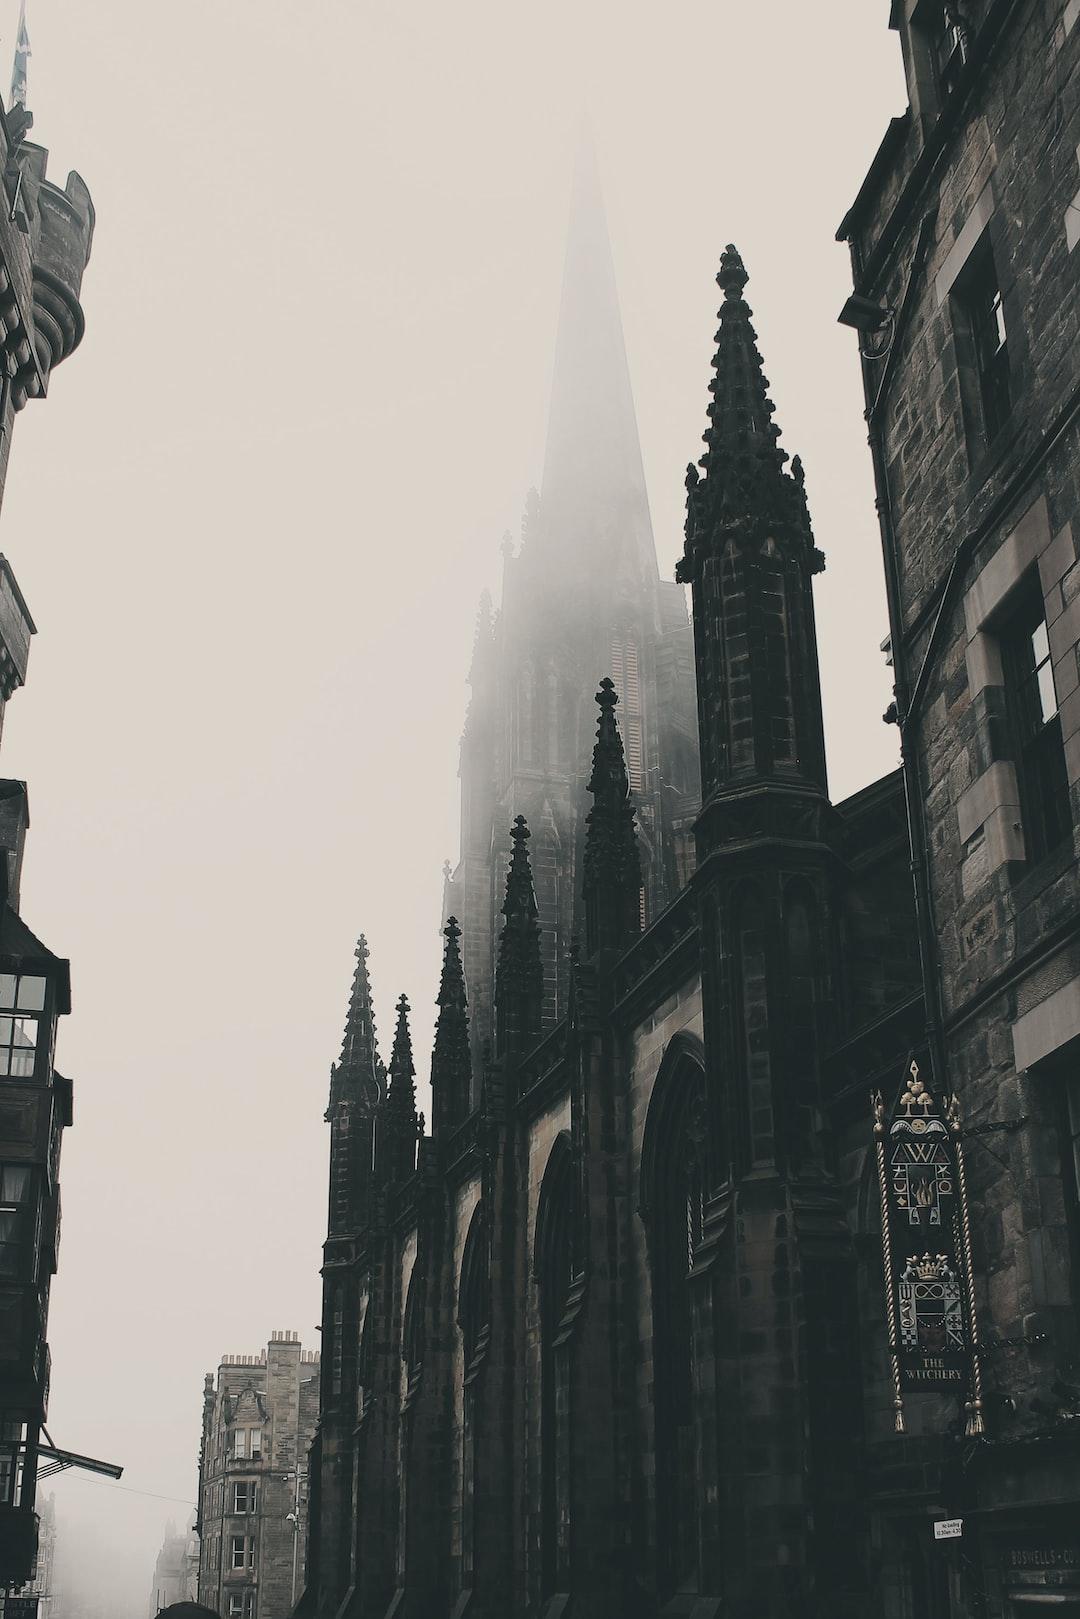 Foggy Street in Edinburgh